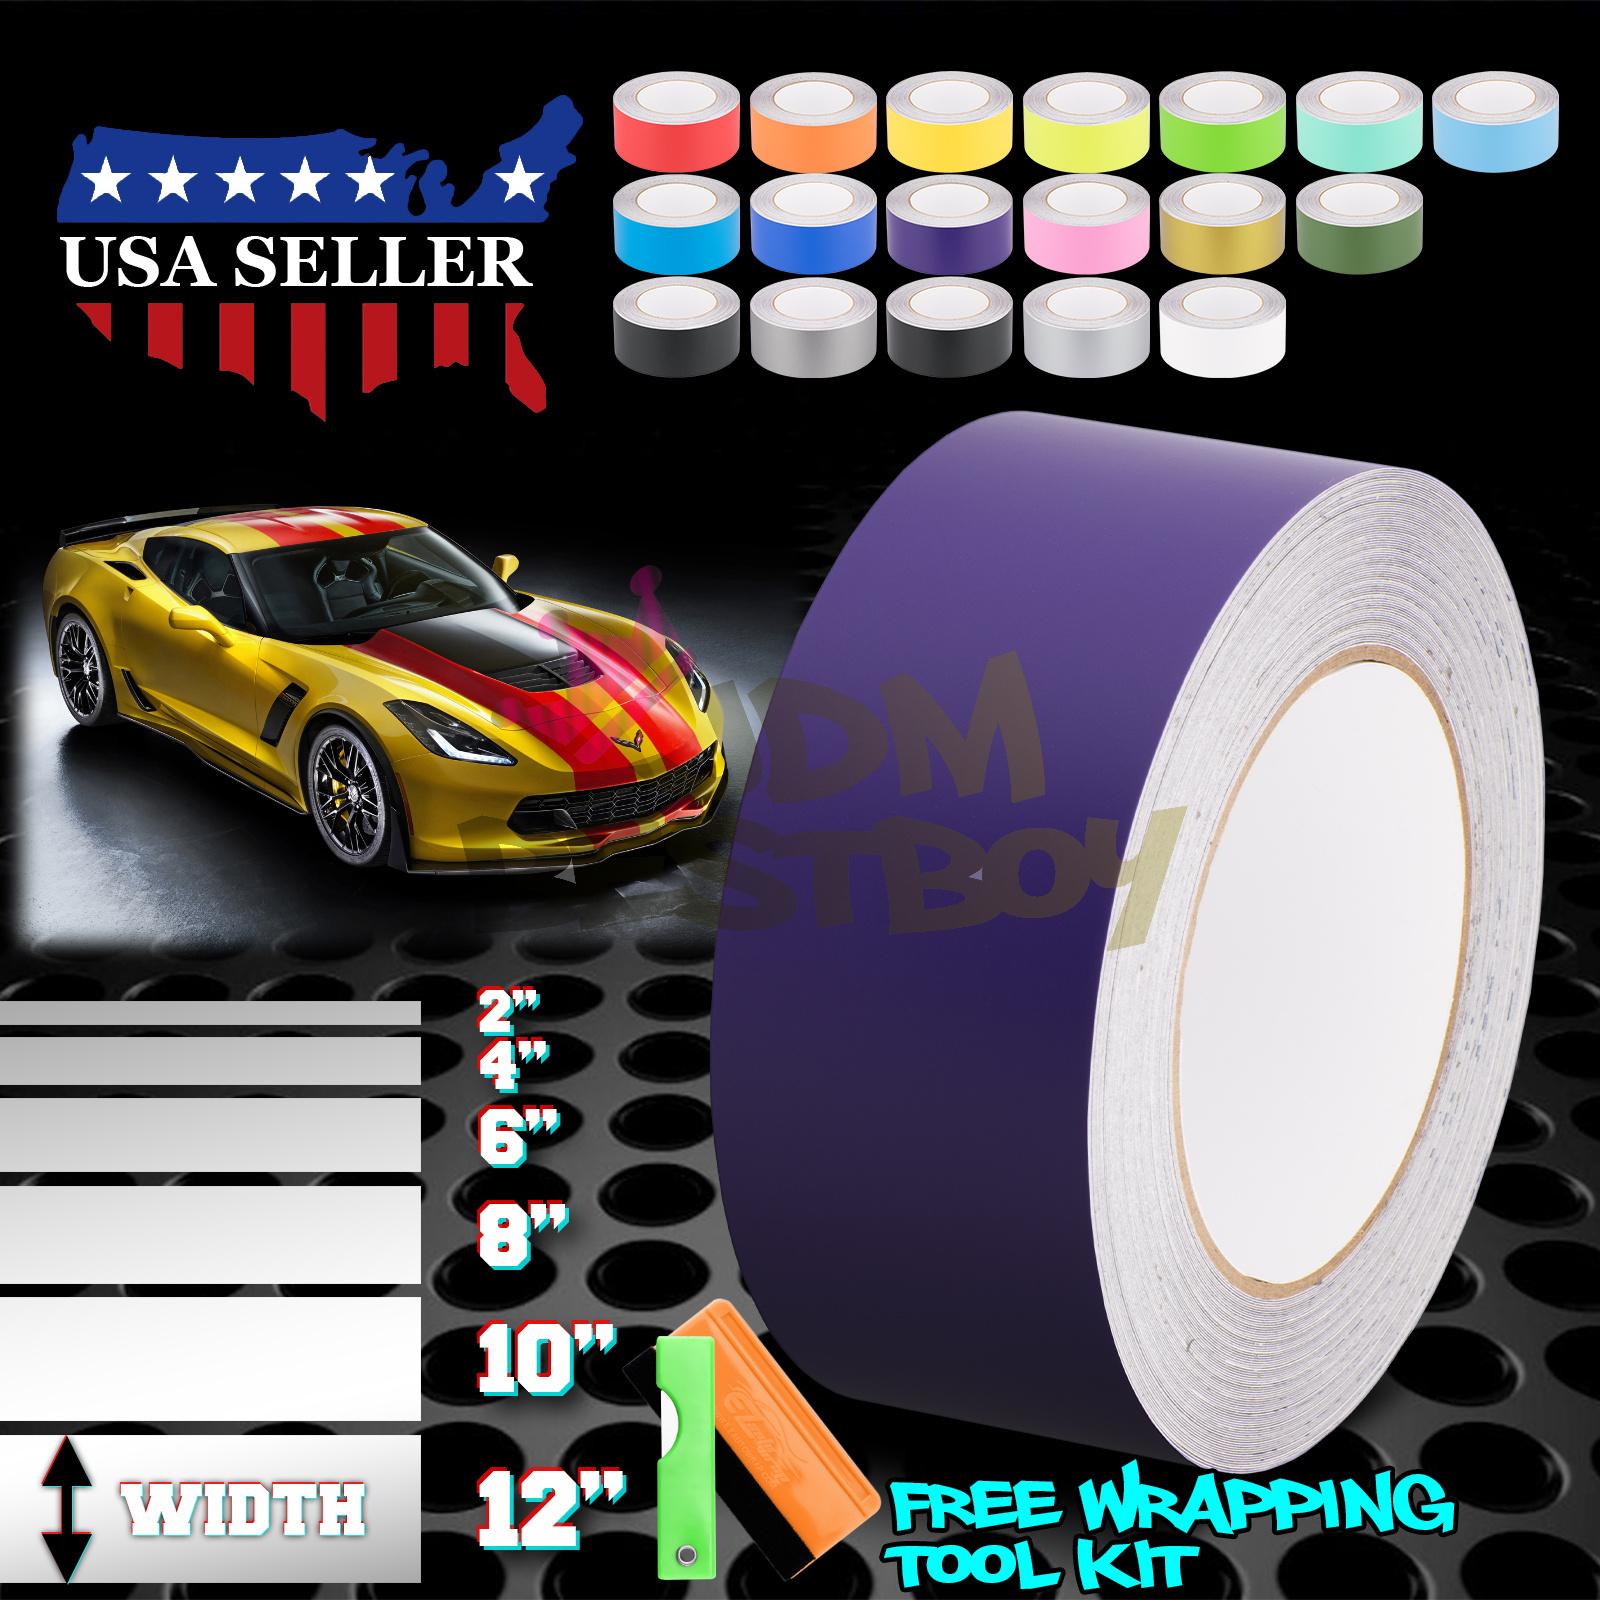 20FT Matte Color Racing Stripes Vinyl Wrap Decal For Mini Cooper Stripe 10FT